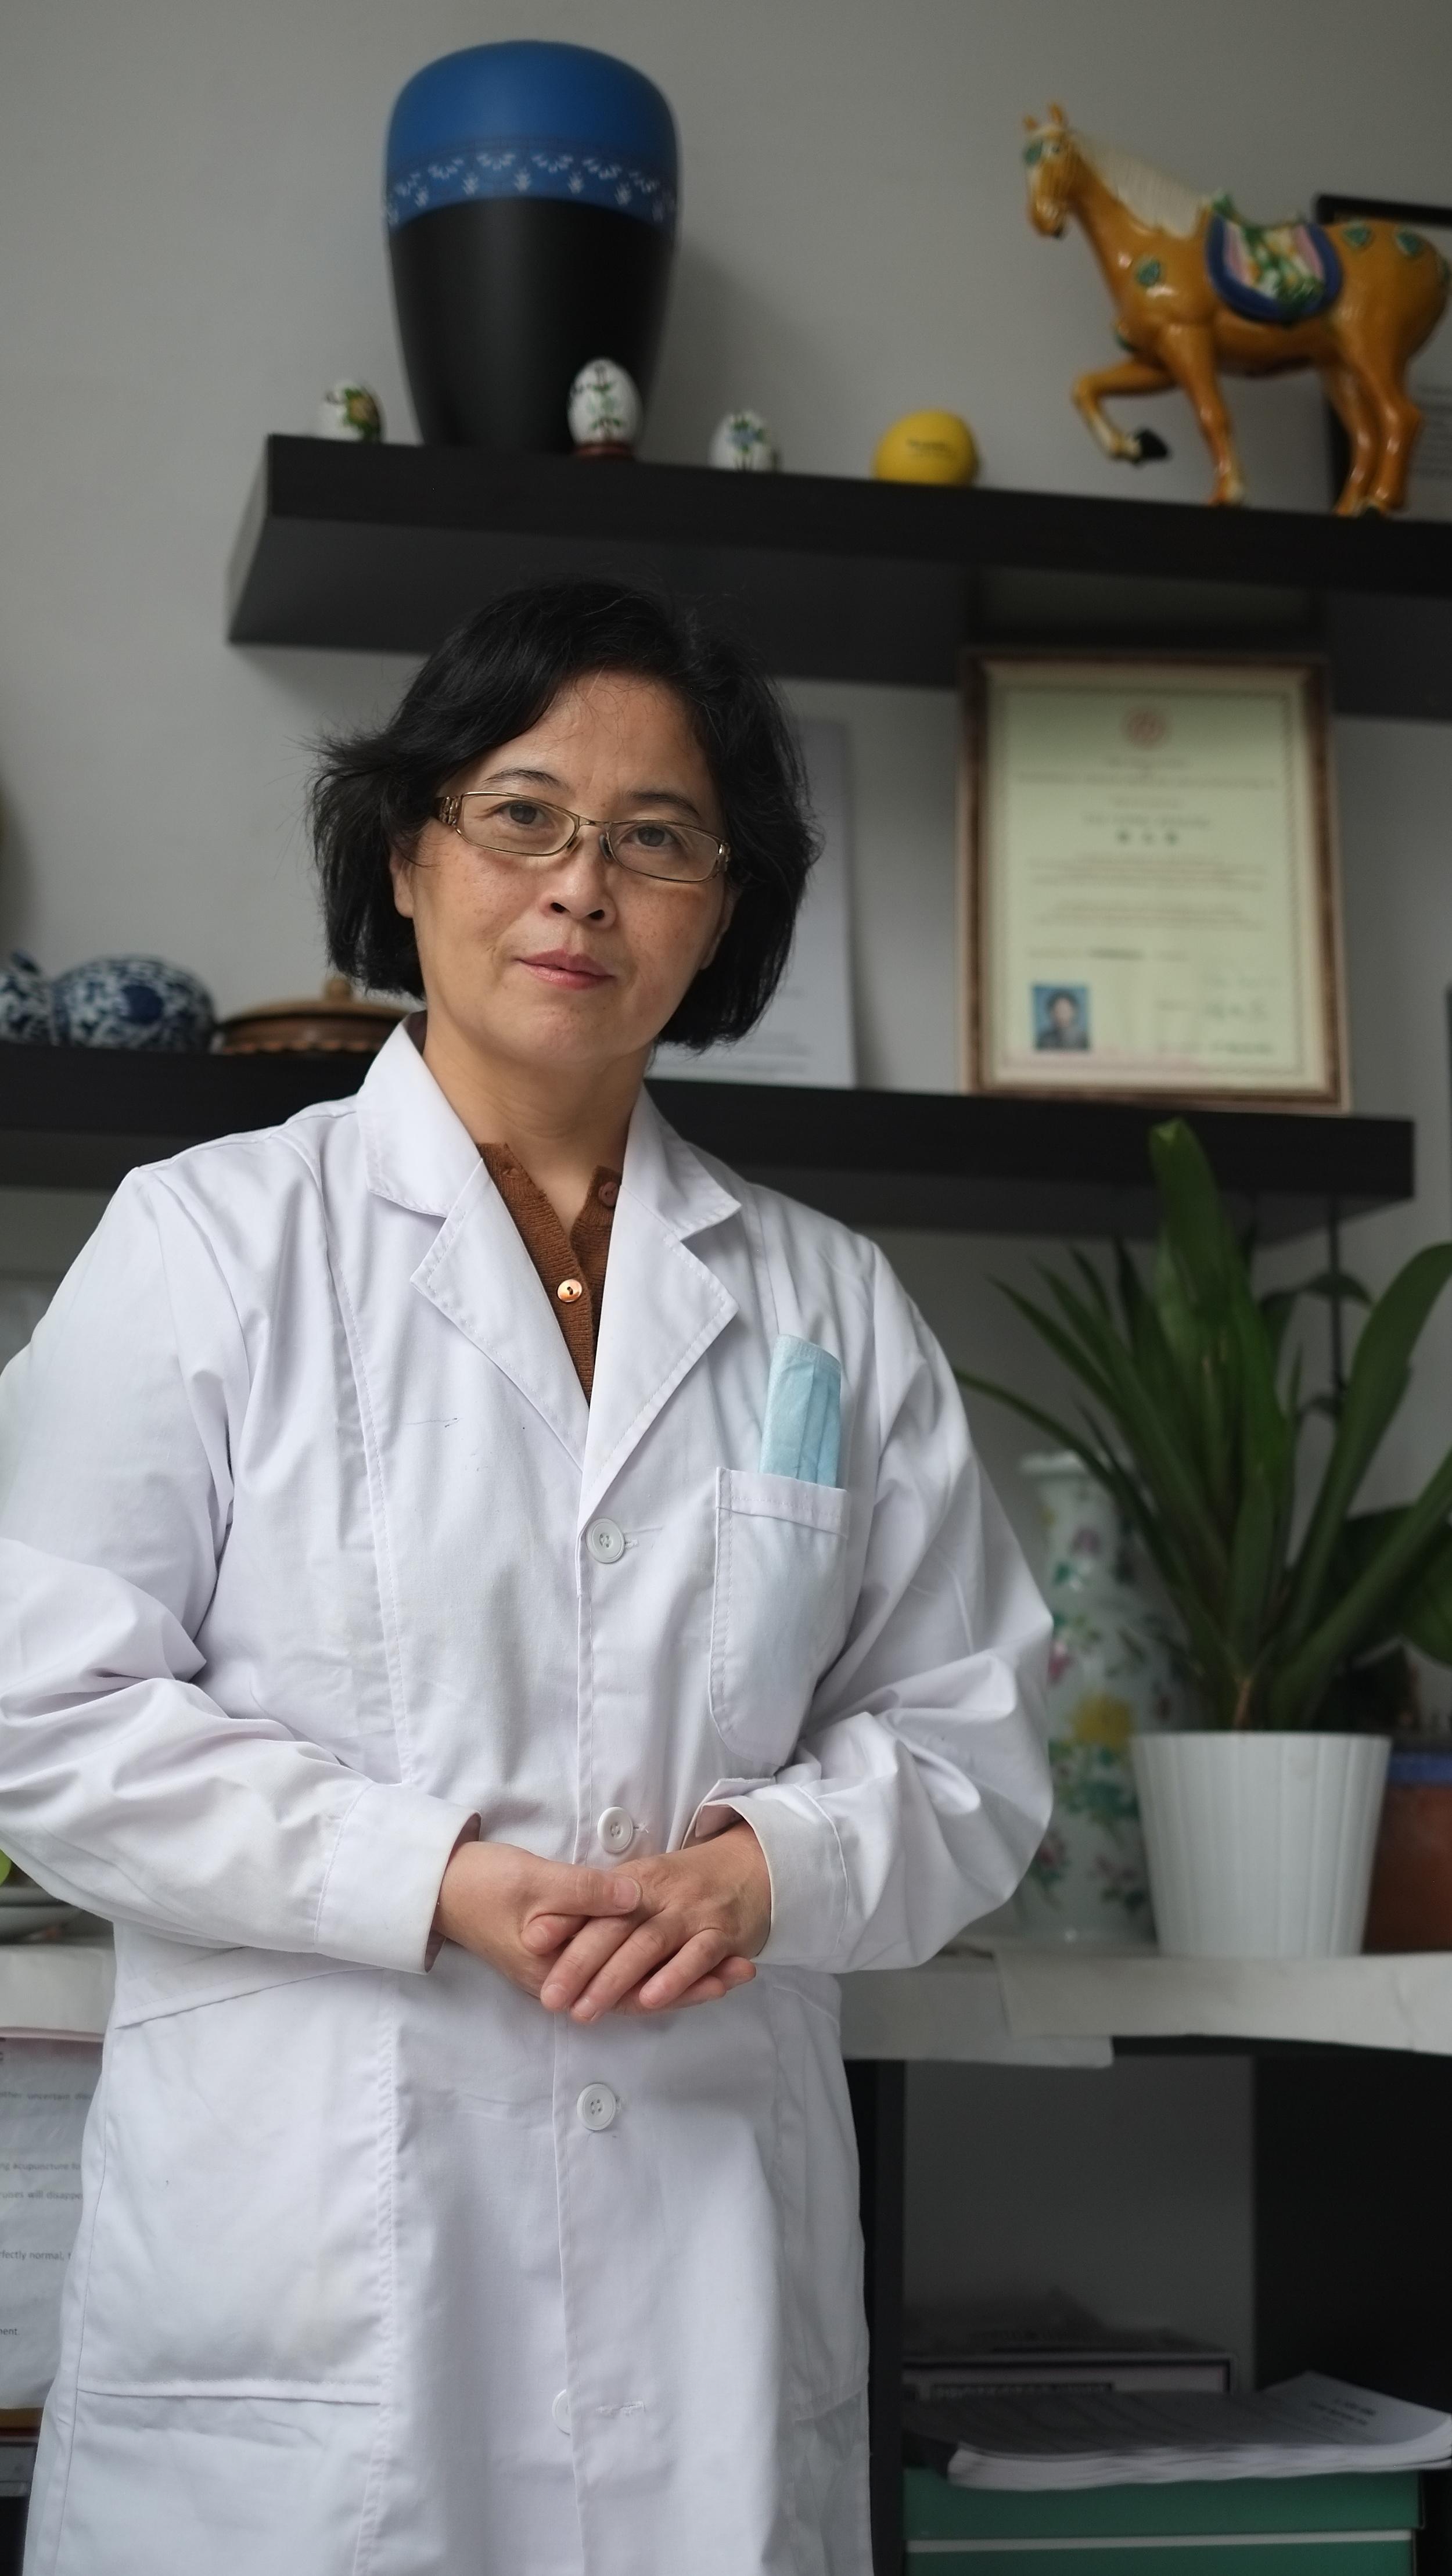 RRC Dr. Zhang